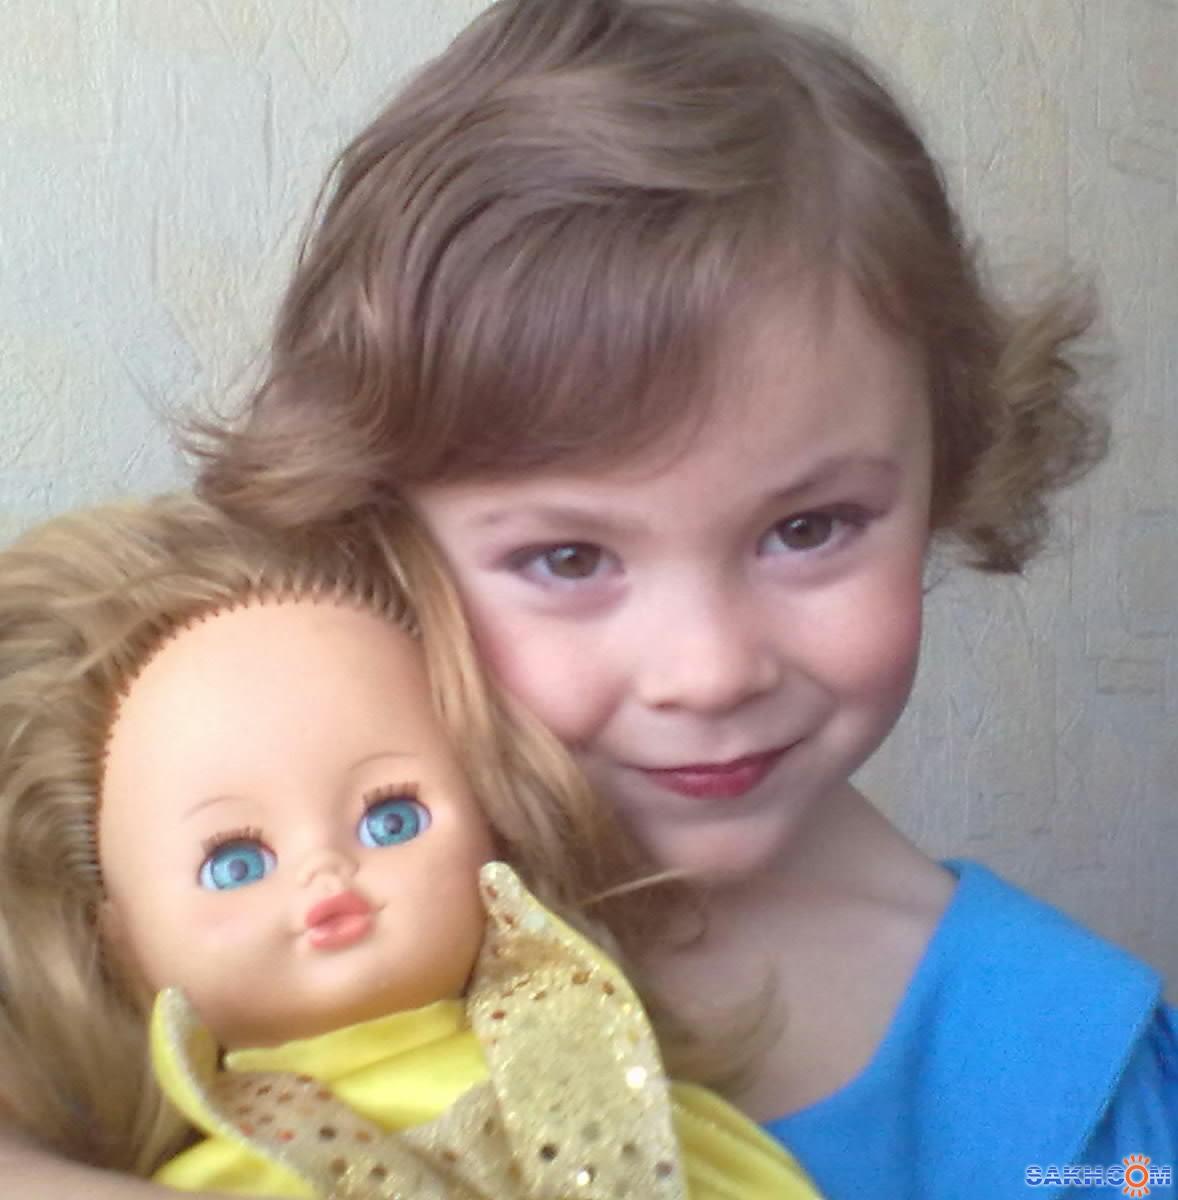 борзой-ким: моя кукла